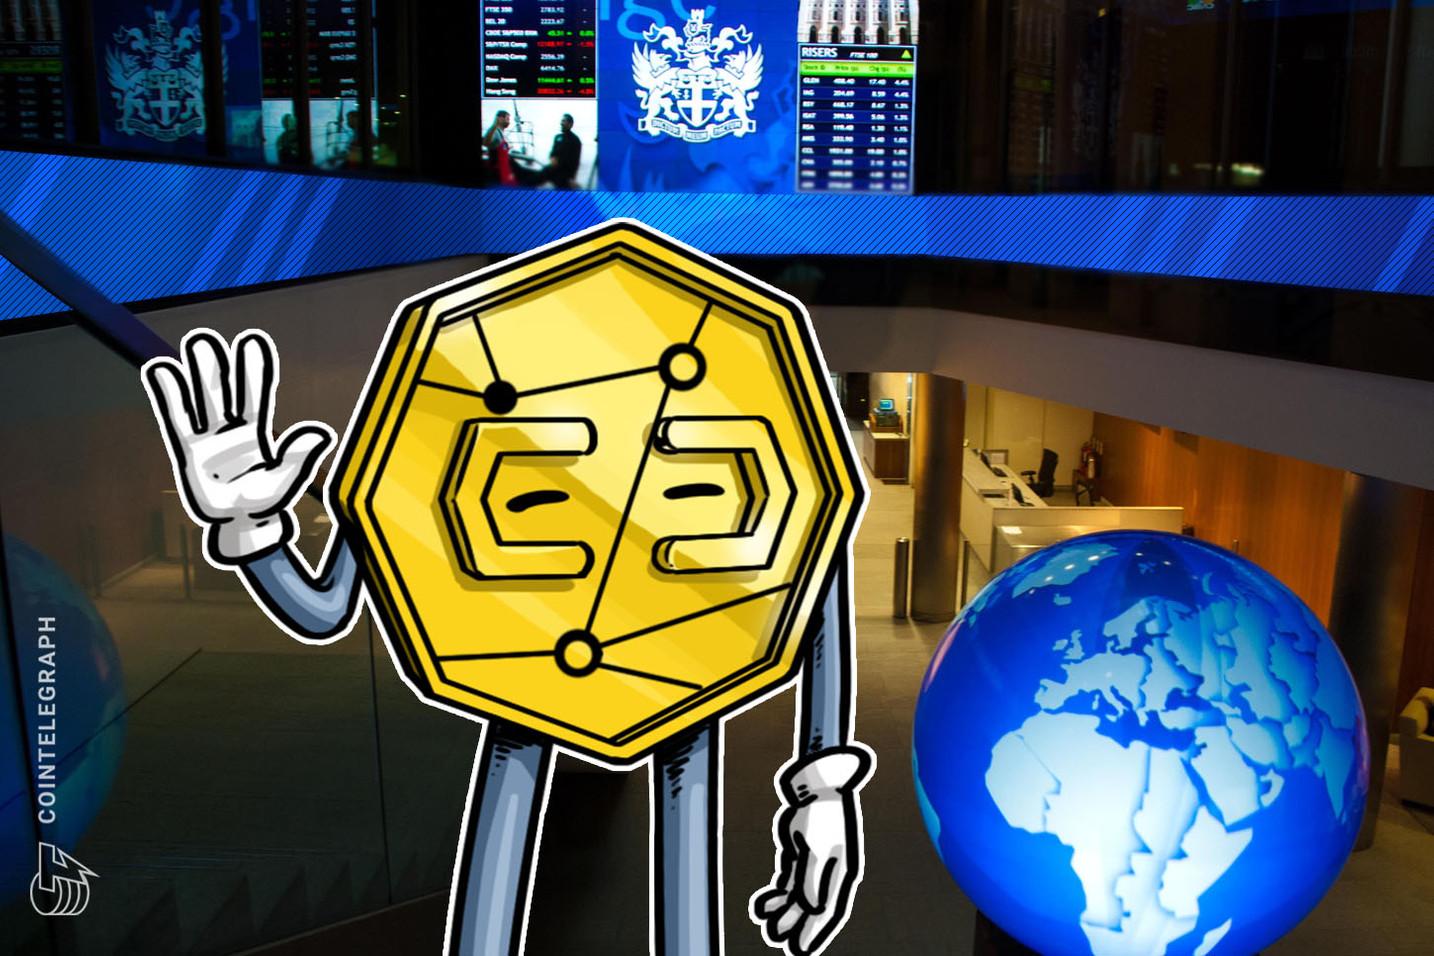 London Stock Exchange Leads $20 Million Investment in Finance Tokenization Startup